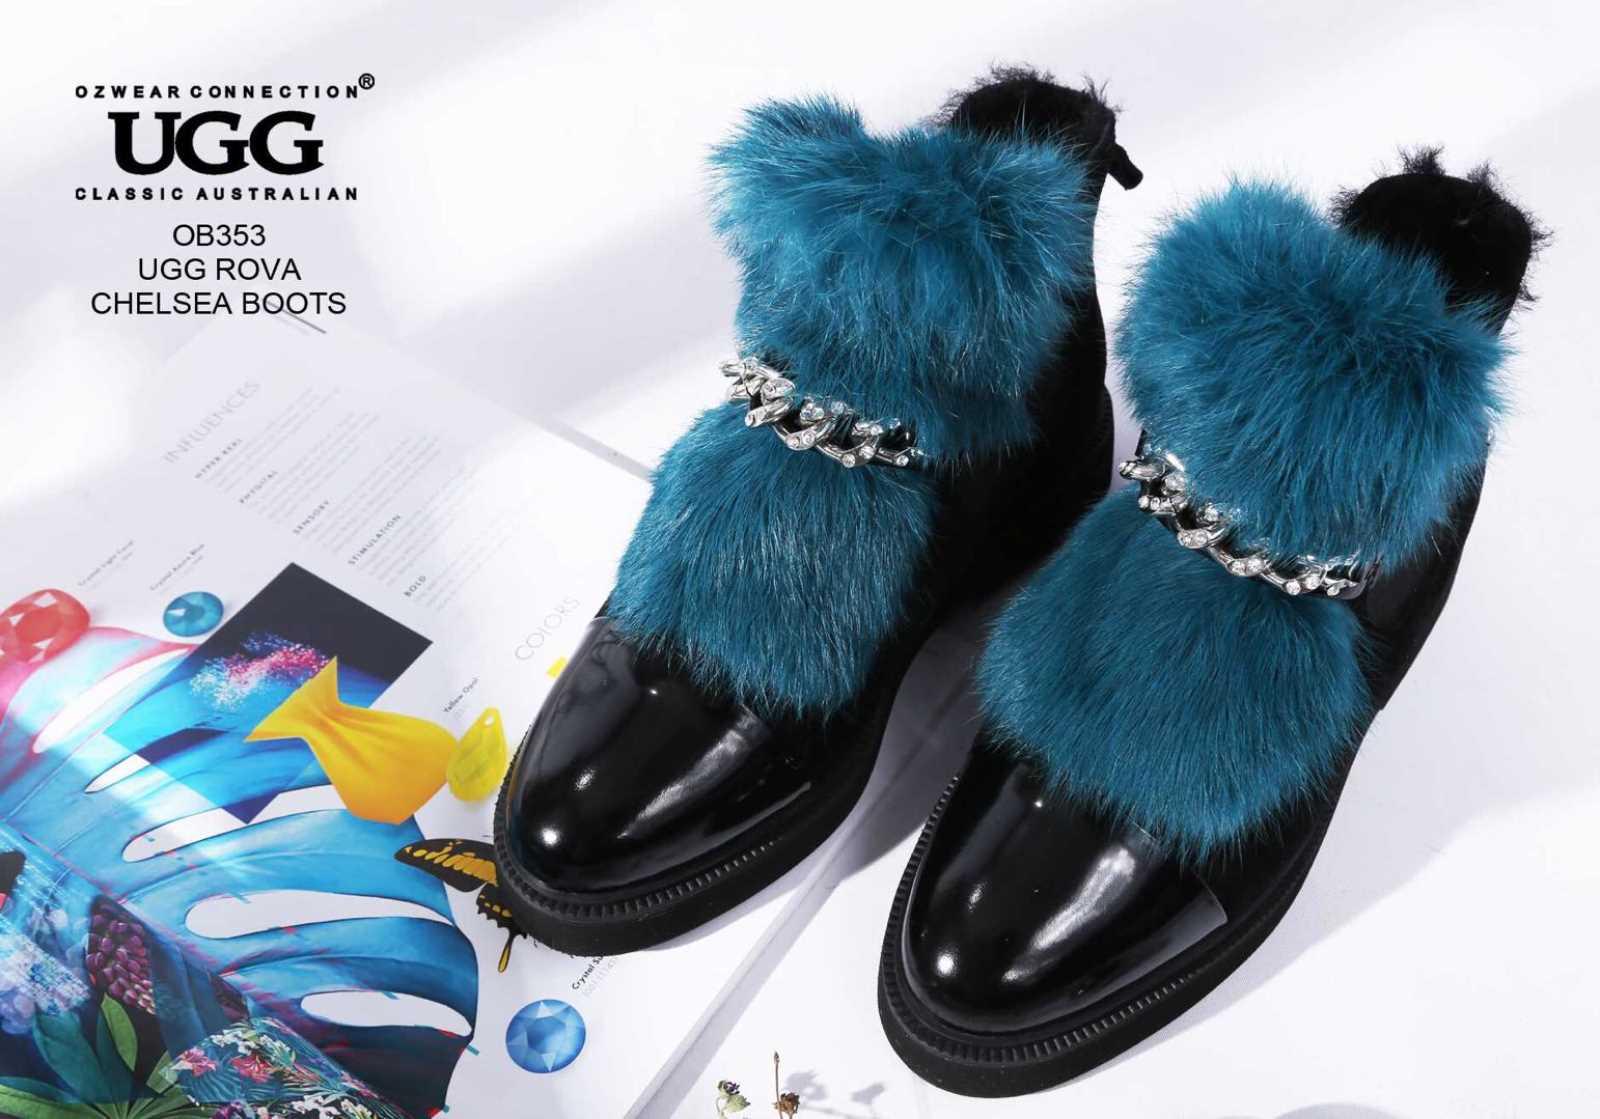 c1b67514da3 Details about UGG OZWEAR LADIES ROVA CHELSEA BOOTS COWHIDE SUEDE SHEEPSKIN  FASHION BOOTS OB353